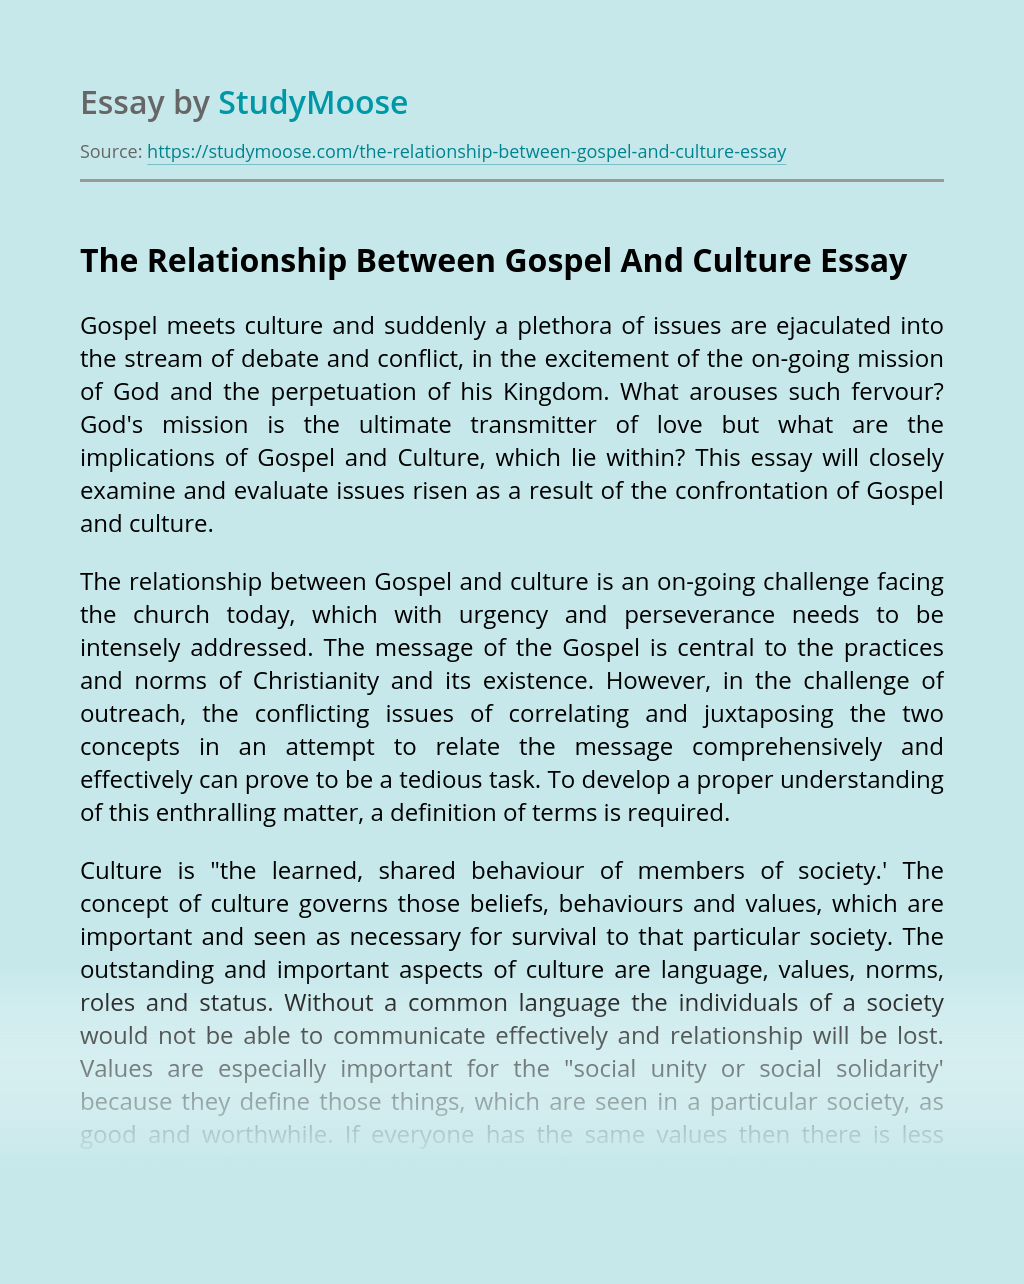 The Relationship Between Gospel And Culture